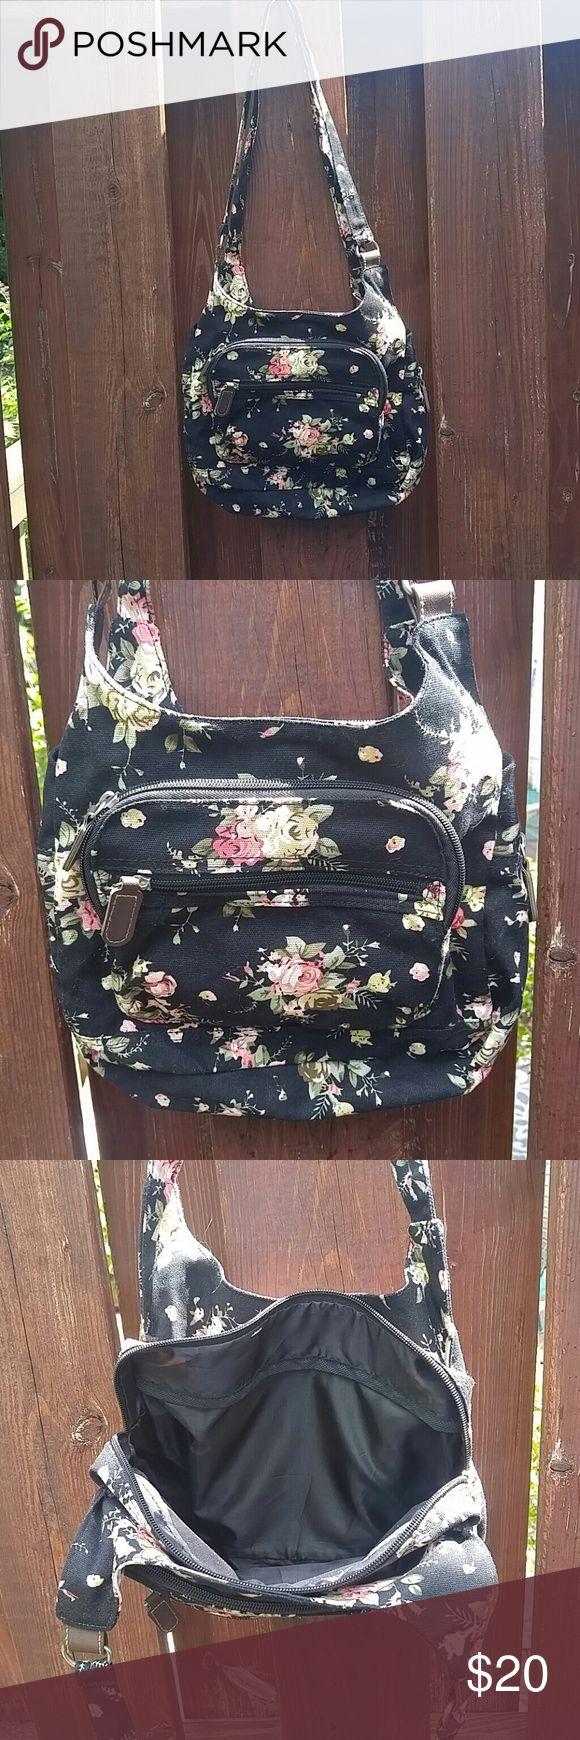 Purse No brand name no name Bags Shoulder Bags